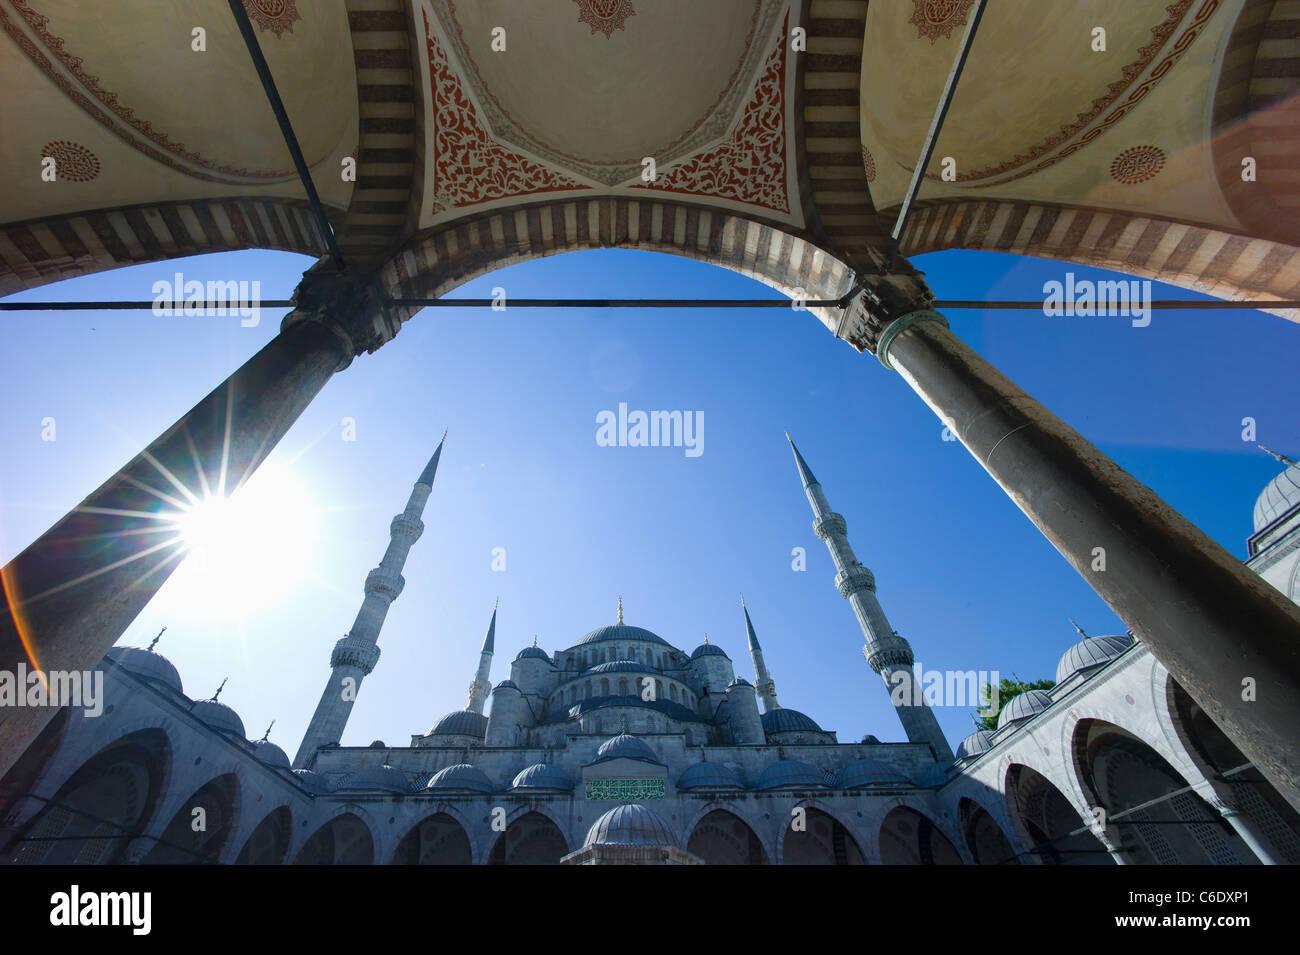 A Turquia, Istambul, Mesquita Azul Imagens de Stock